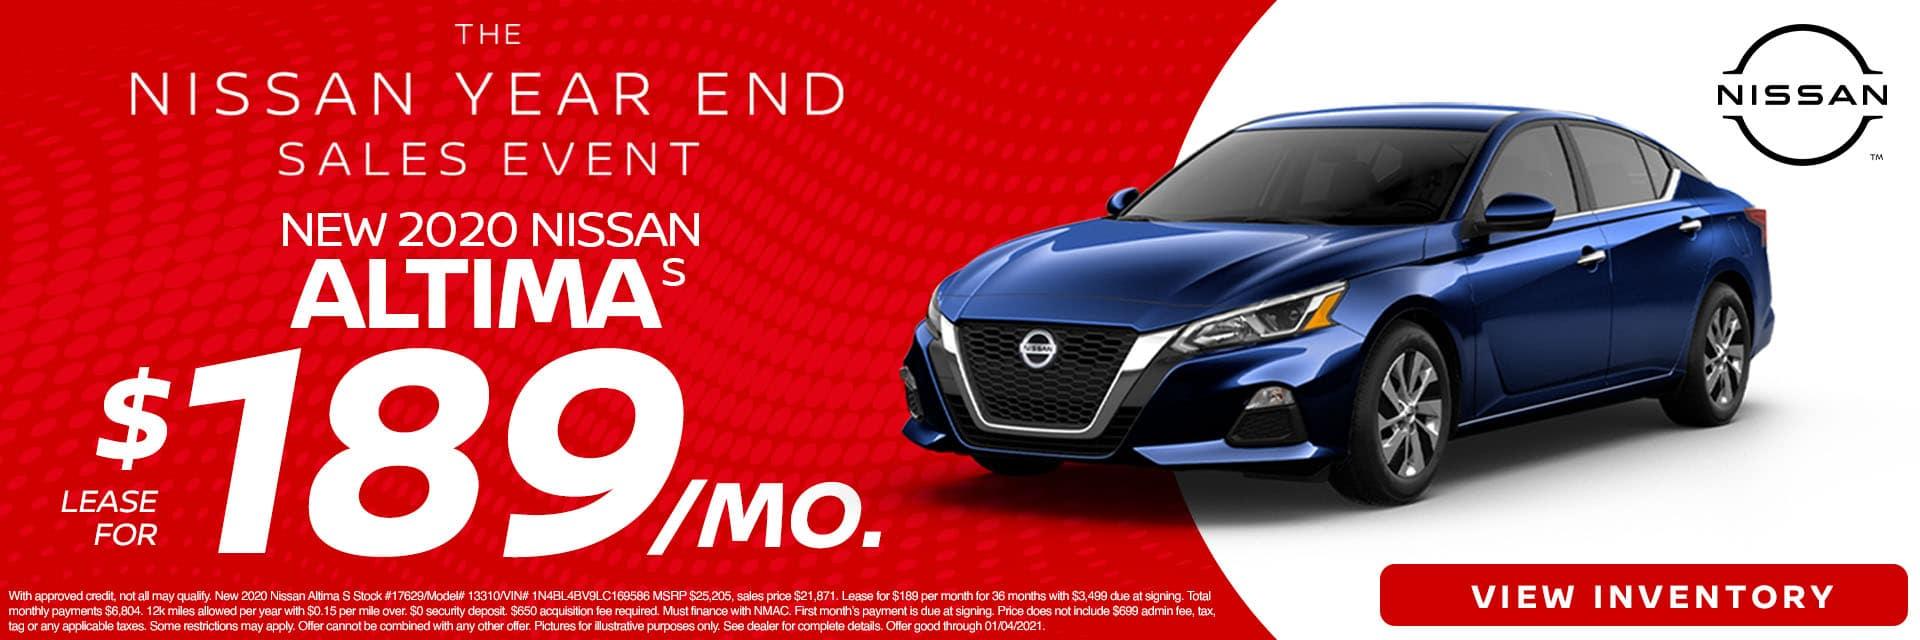 CNSN-December 2020-2020 Nissan Altima